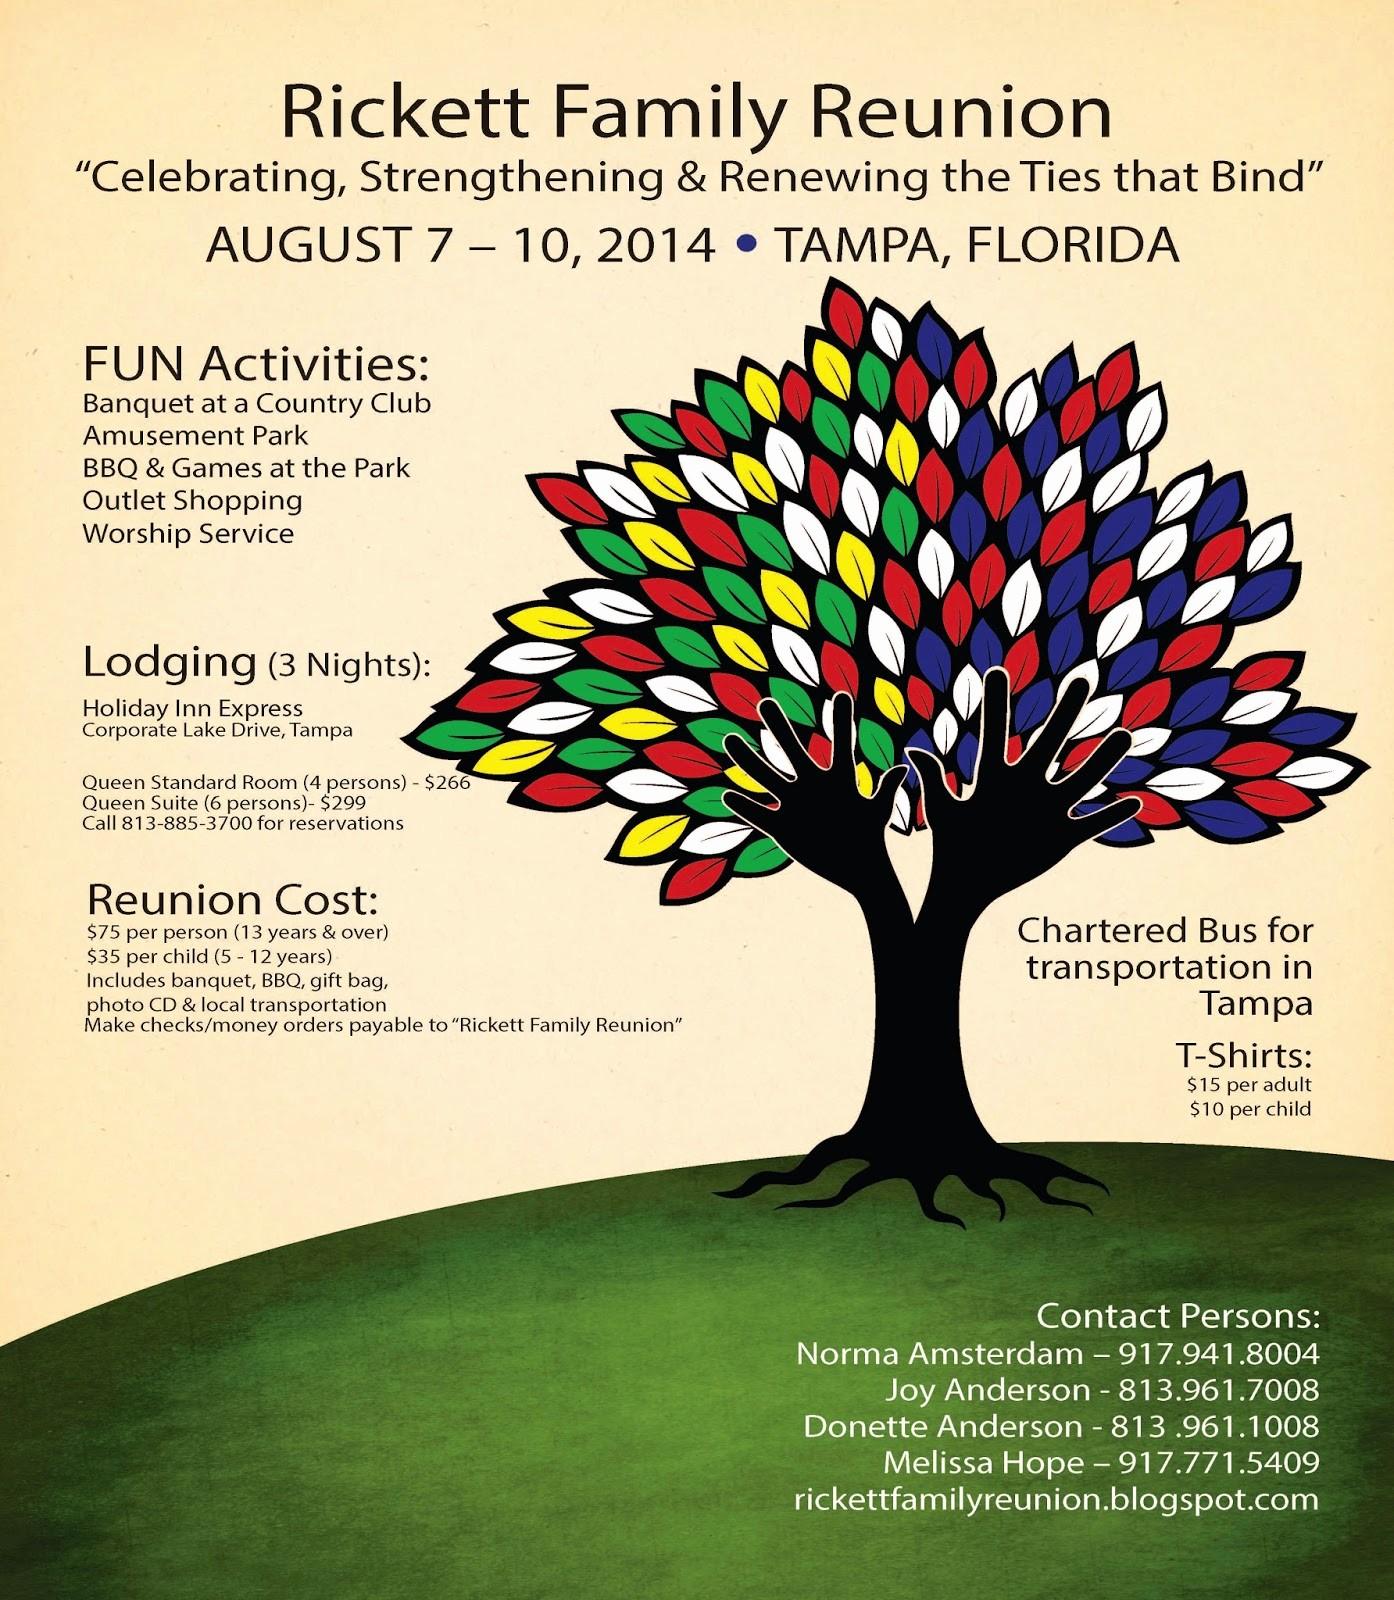 Free Family Reunion Flyers Templates Luxury Rickett Family Reunion Blog